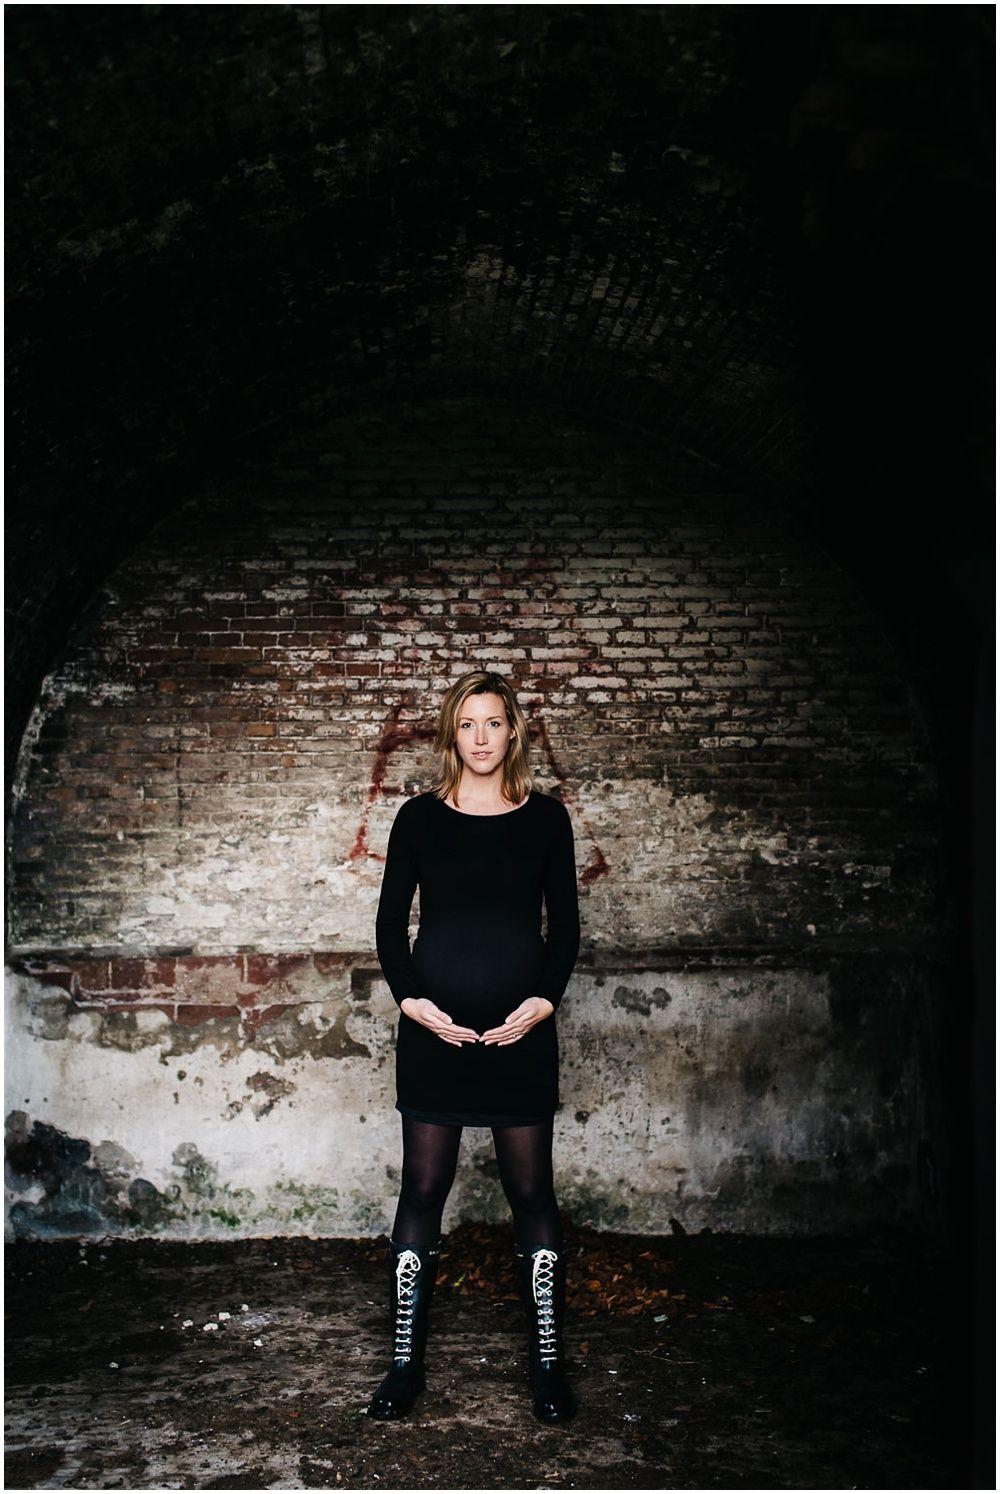 Stoere zwangerschapsfotografie fotograaf zwangerschap fotoshoot buiten